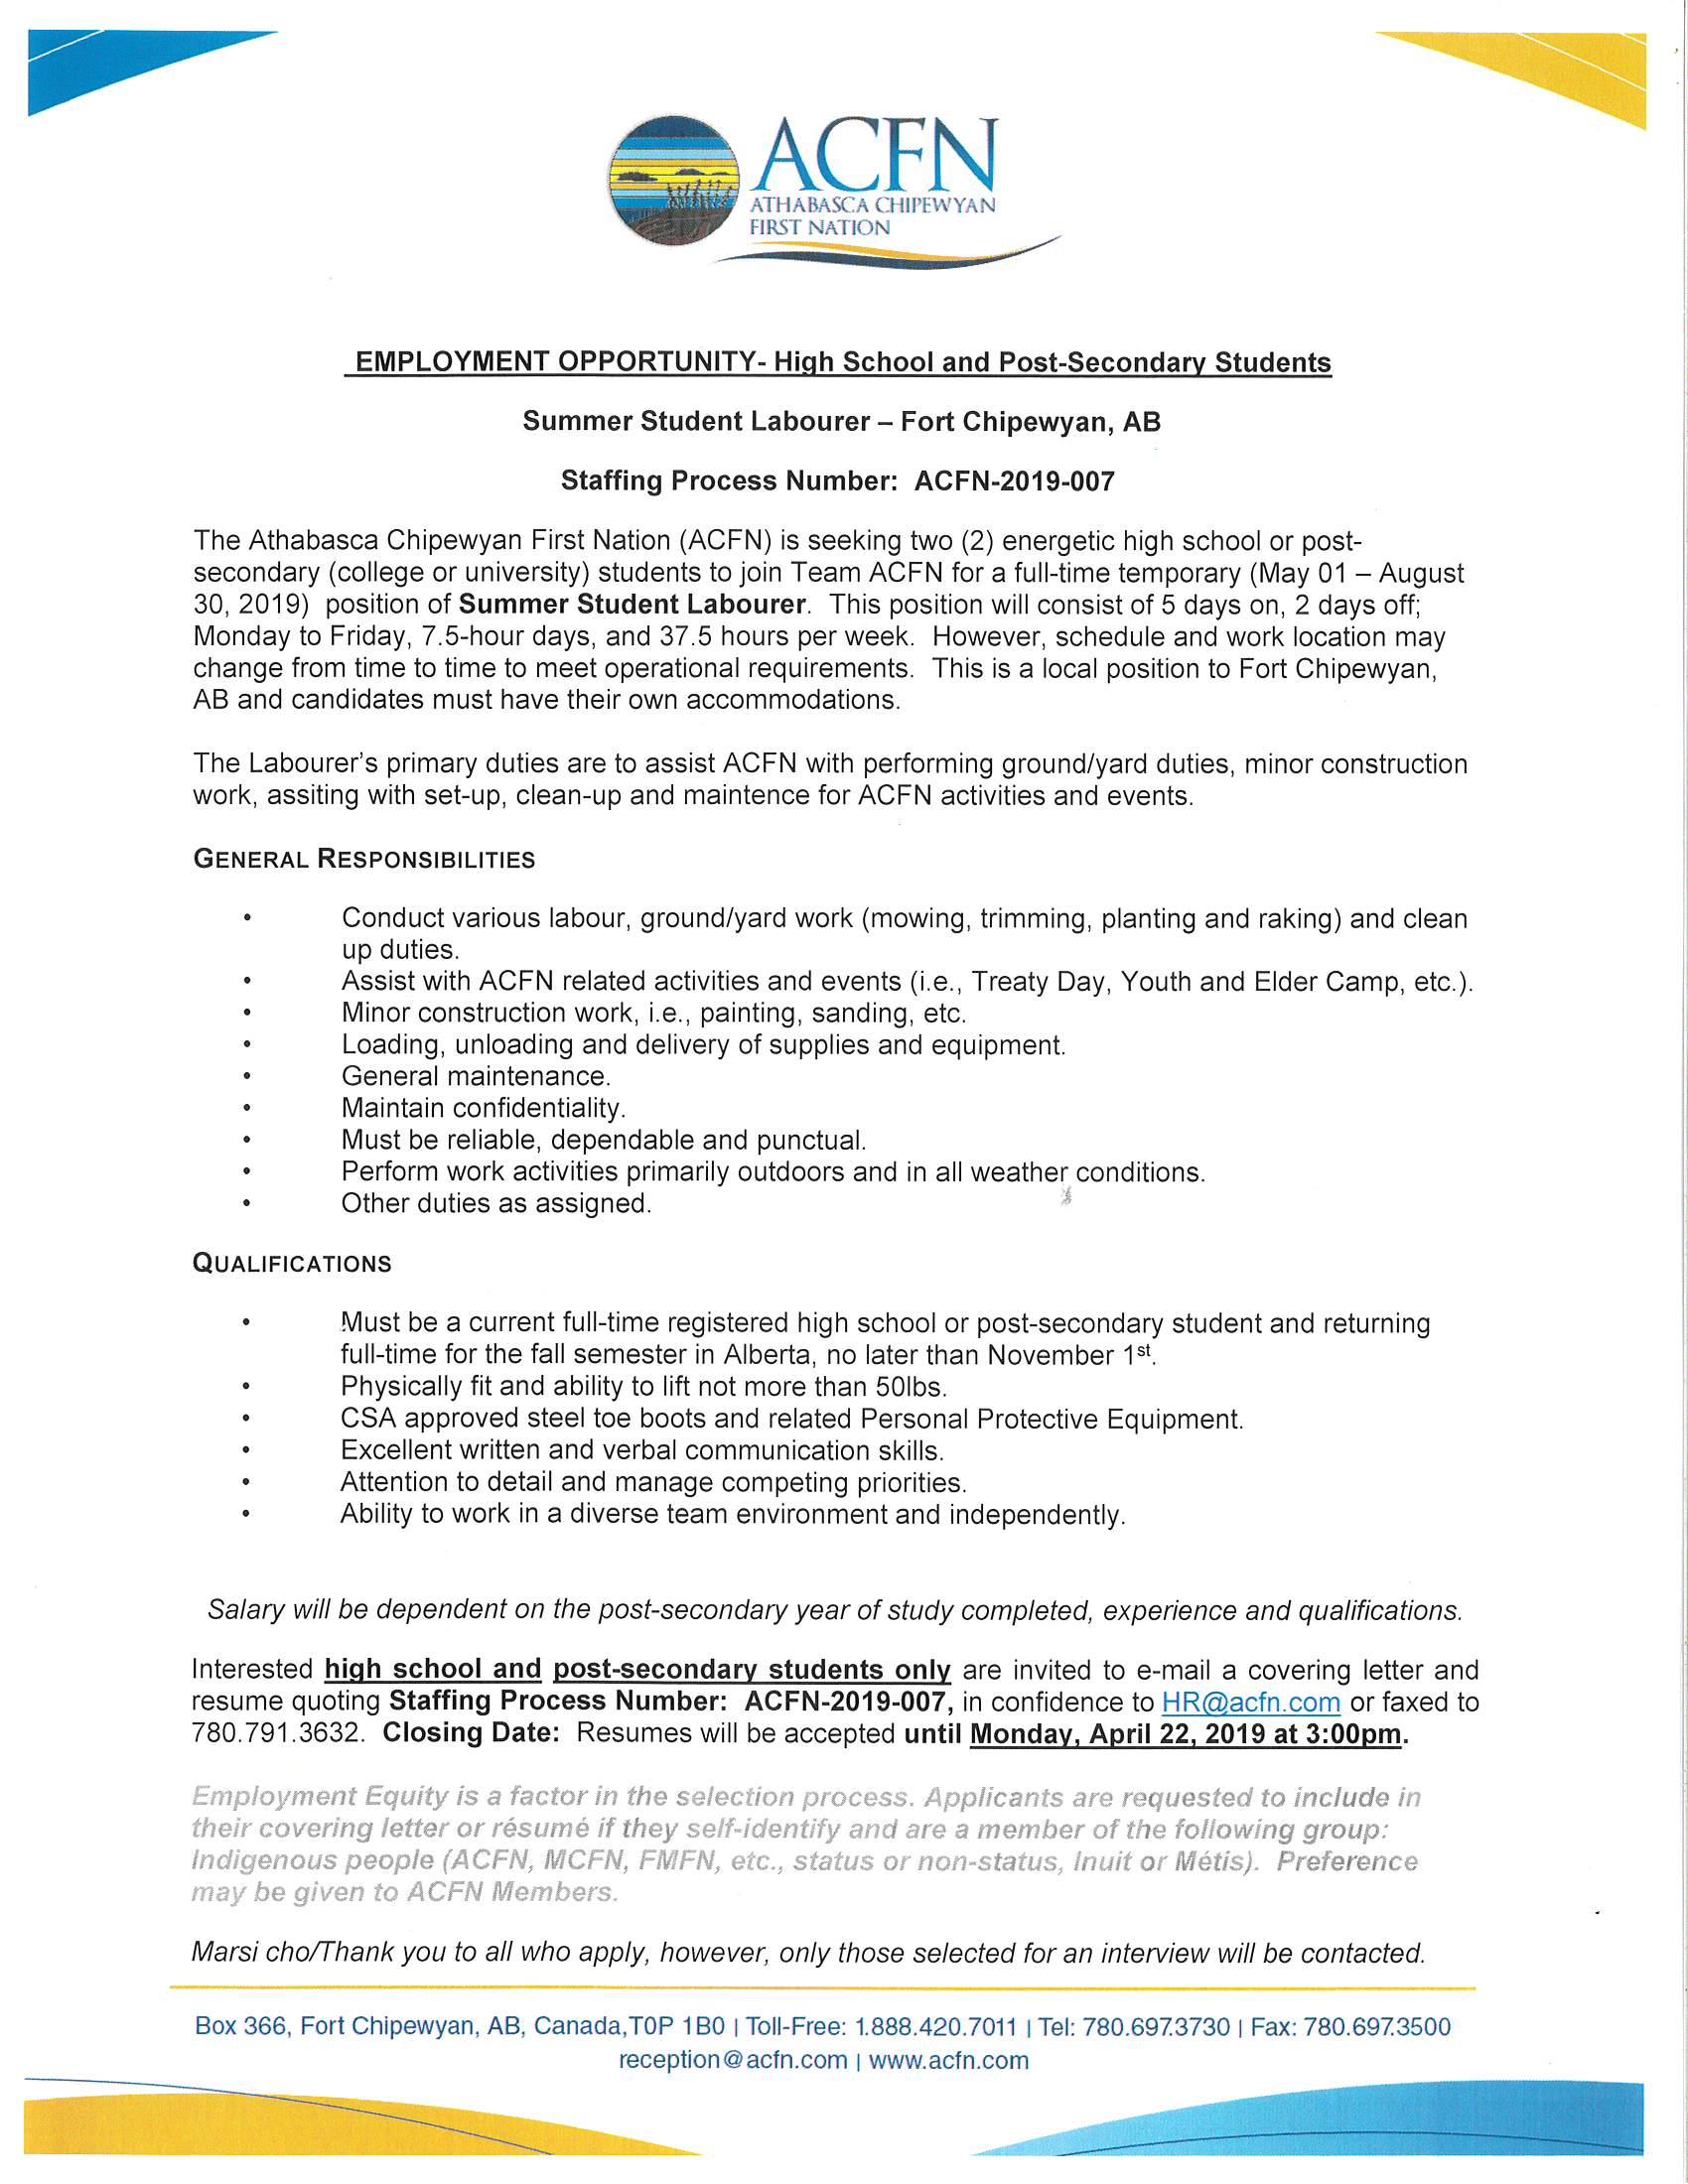 Employment Opportunity - Summer Student Labourer - Fort Chipewyan